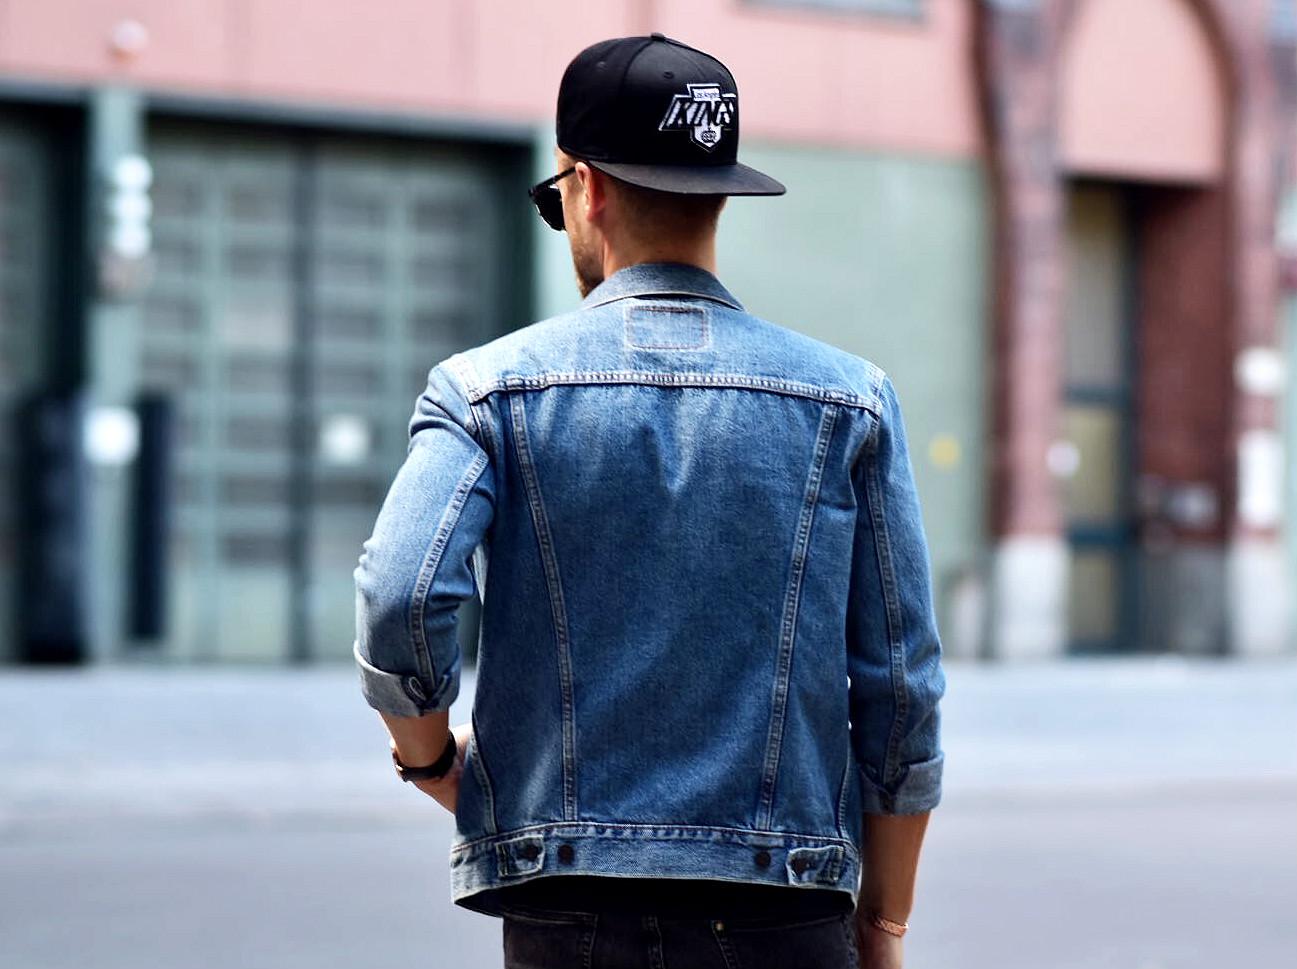 Tommeezjerry-Styleblog-Männerblog-Männer-Modeblog-Berlin-Berlinblog-Männermodeblog-Fashionblog-Outfit-Denim-Black-Look-Levis-Jeans-New-Era-Daniel-Wellington-Chelsea-Boots-Triwa